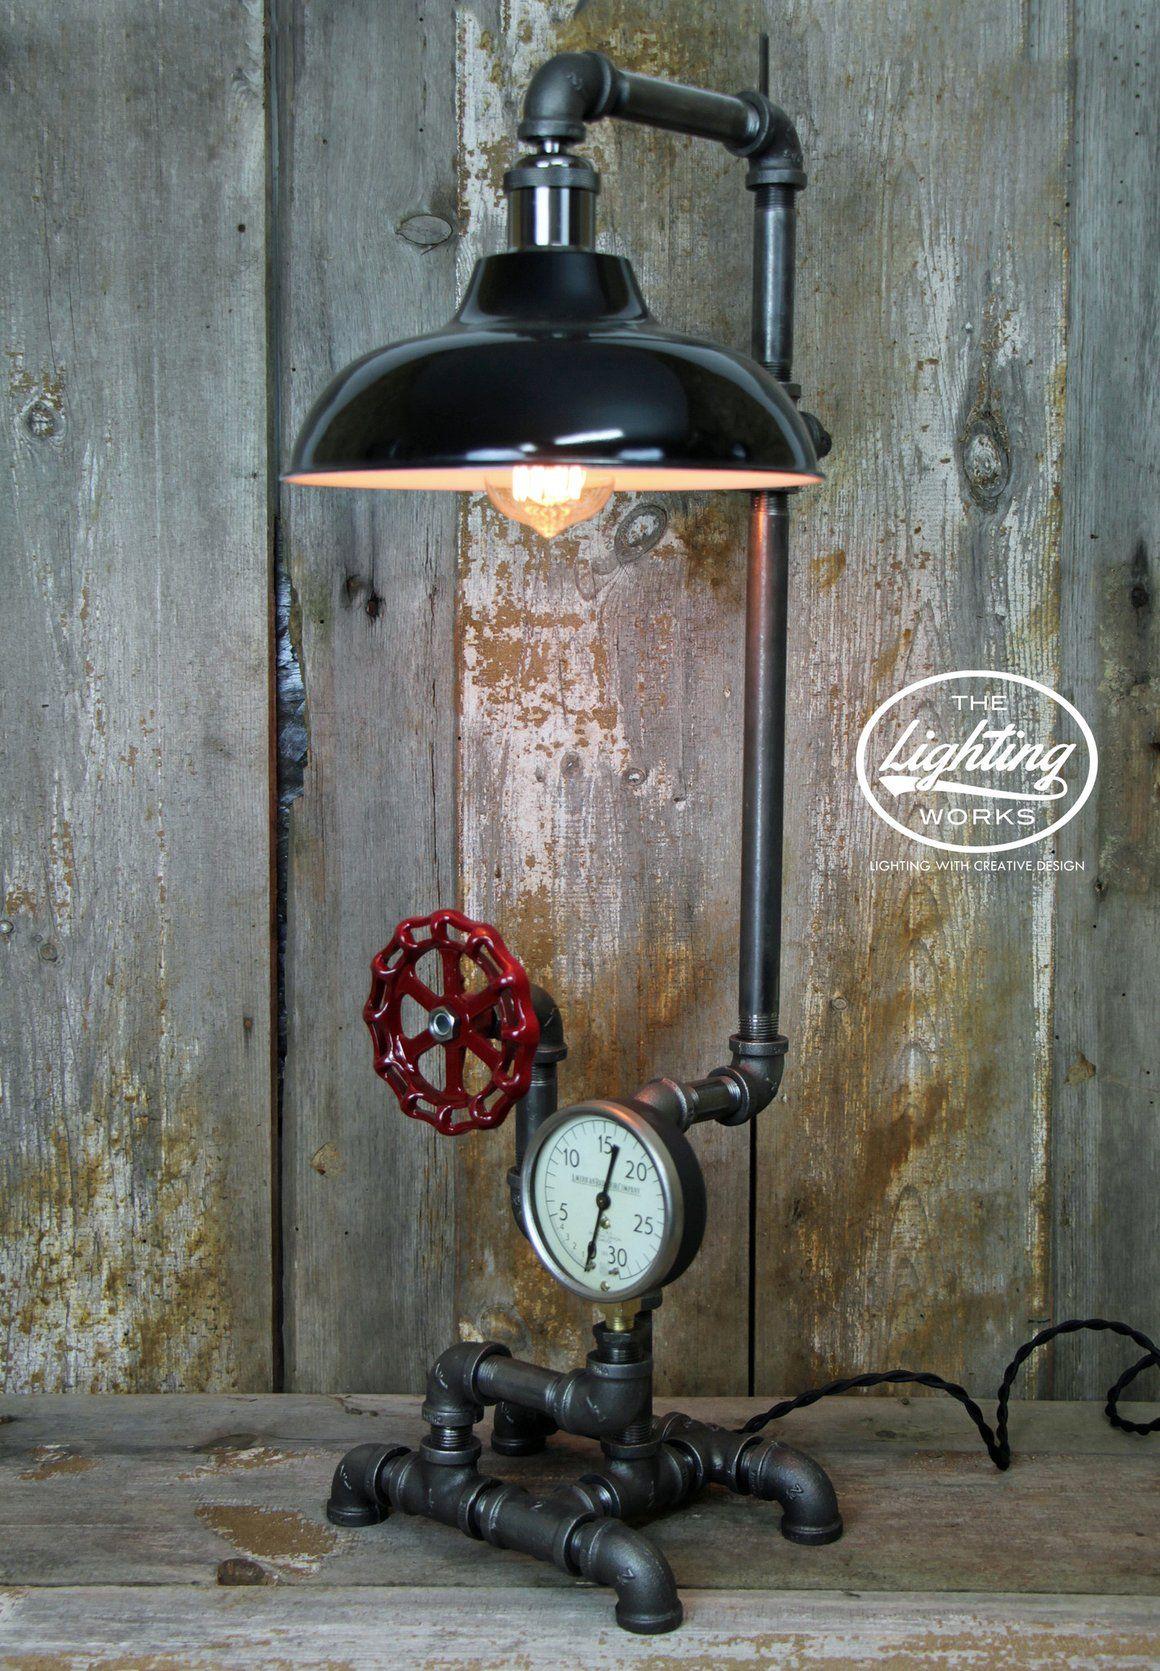 Industrial Table Lamp With A Vintage American Radiator Gauge Industriele Verlichting Industriele Lampen Verlichting